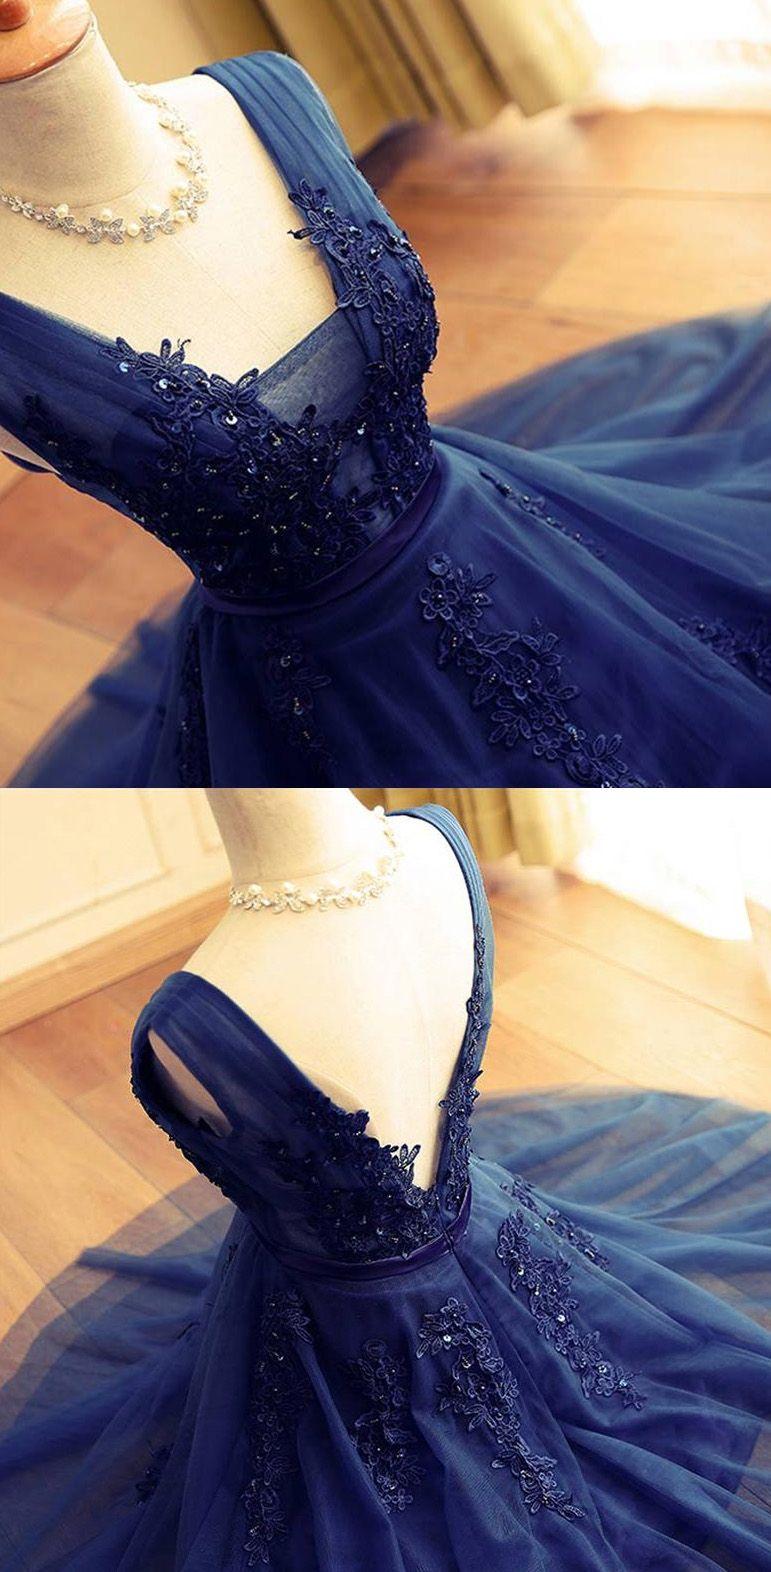 Sleeveless homecoming dresses navy sleeveless homecoming dresses